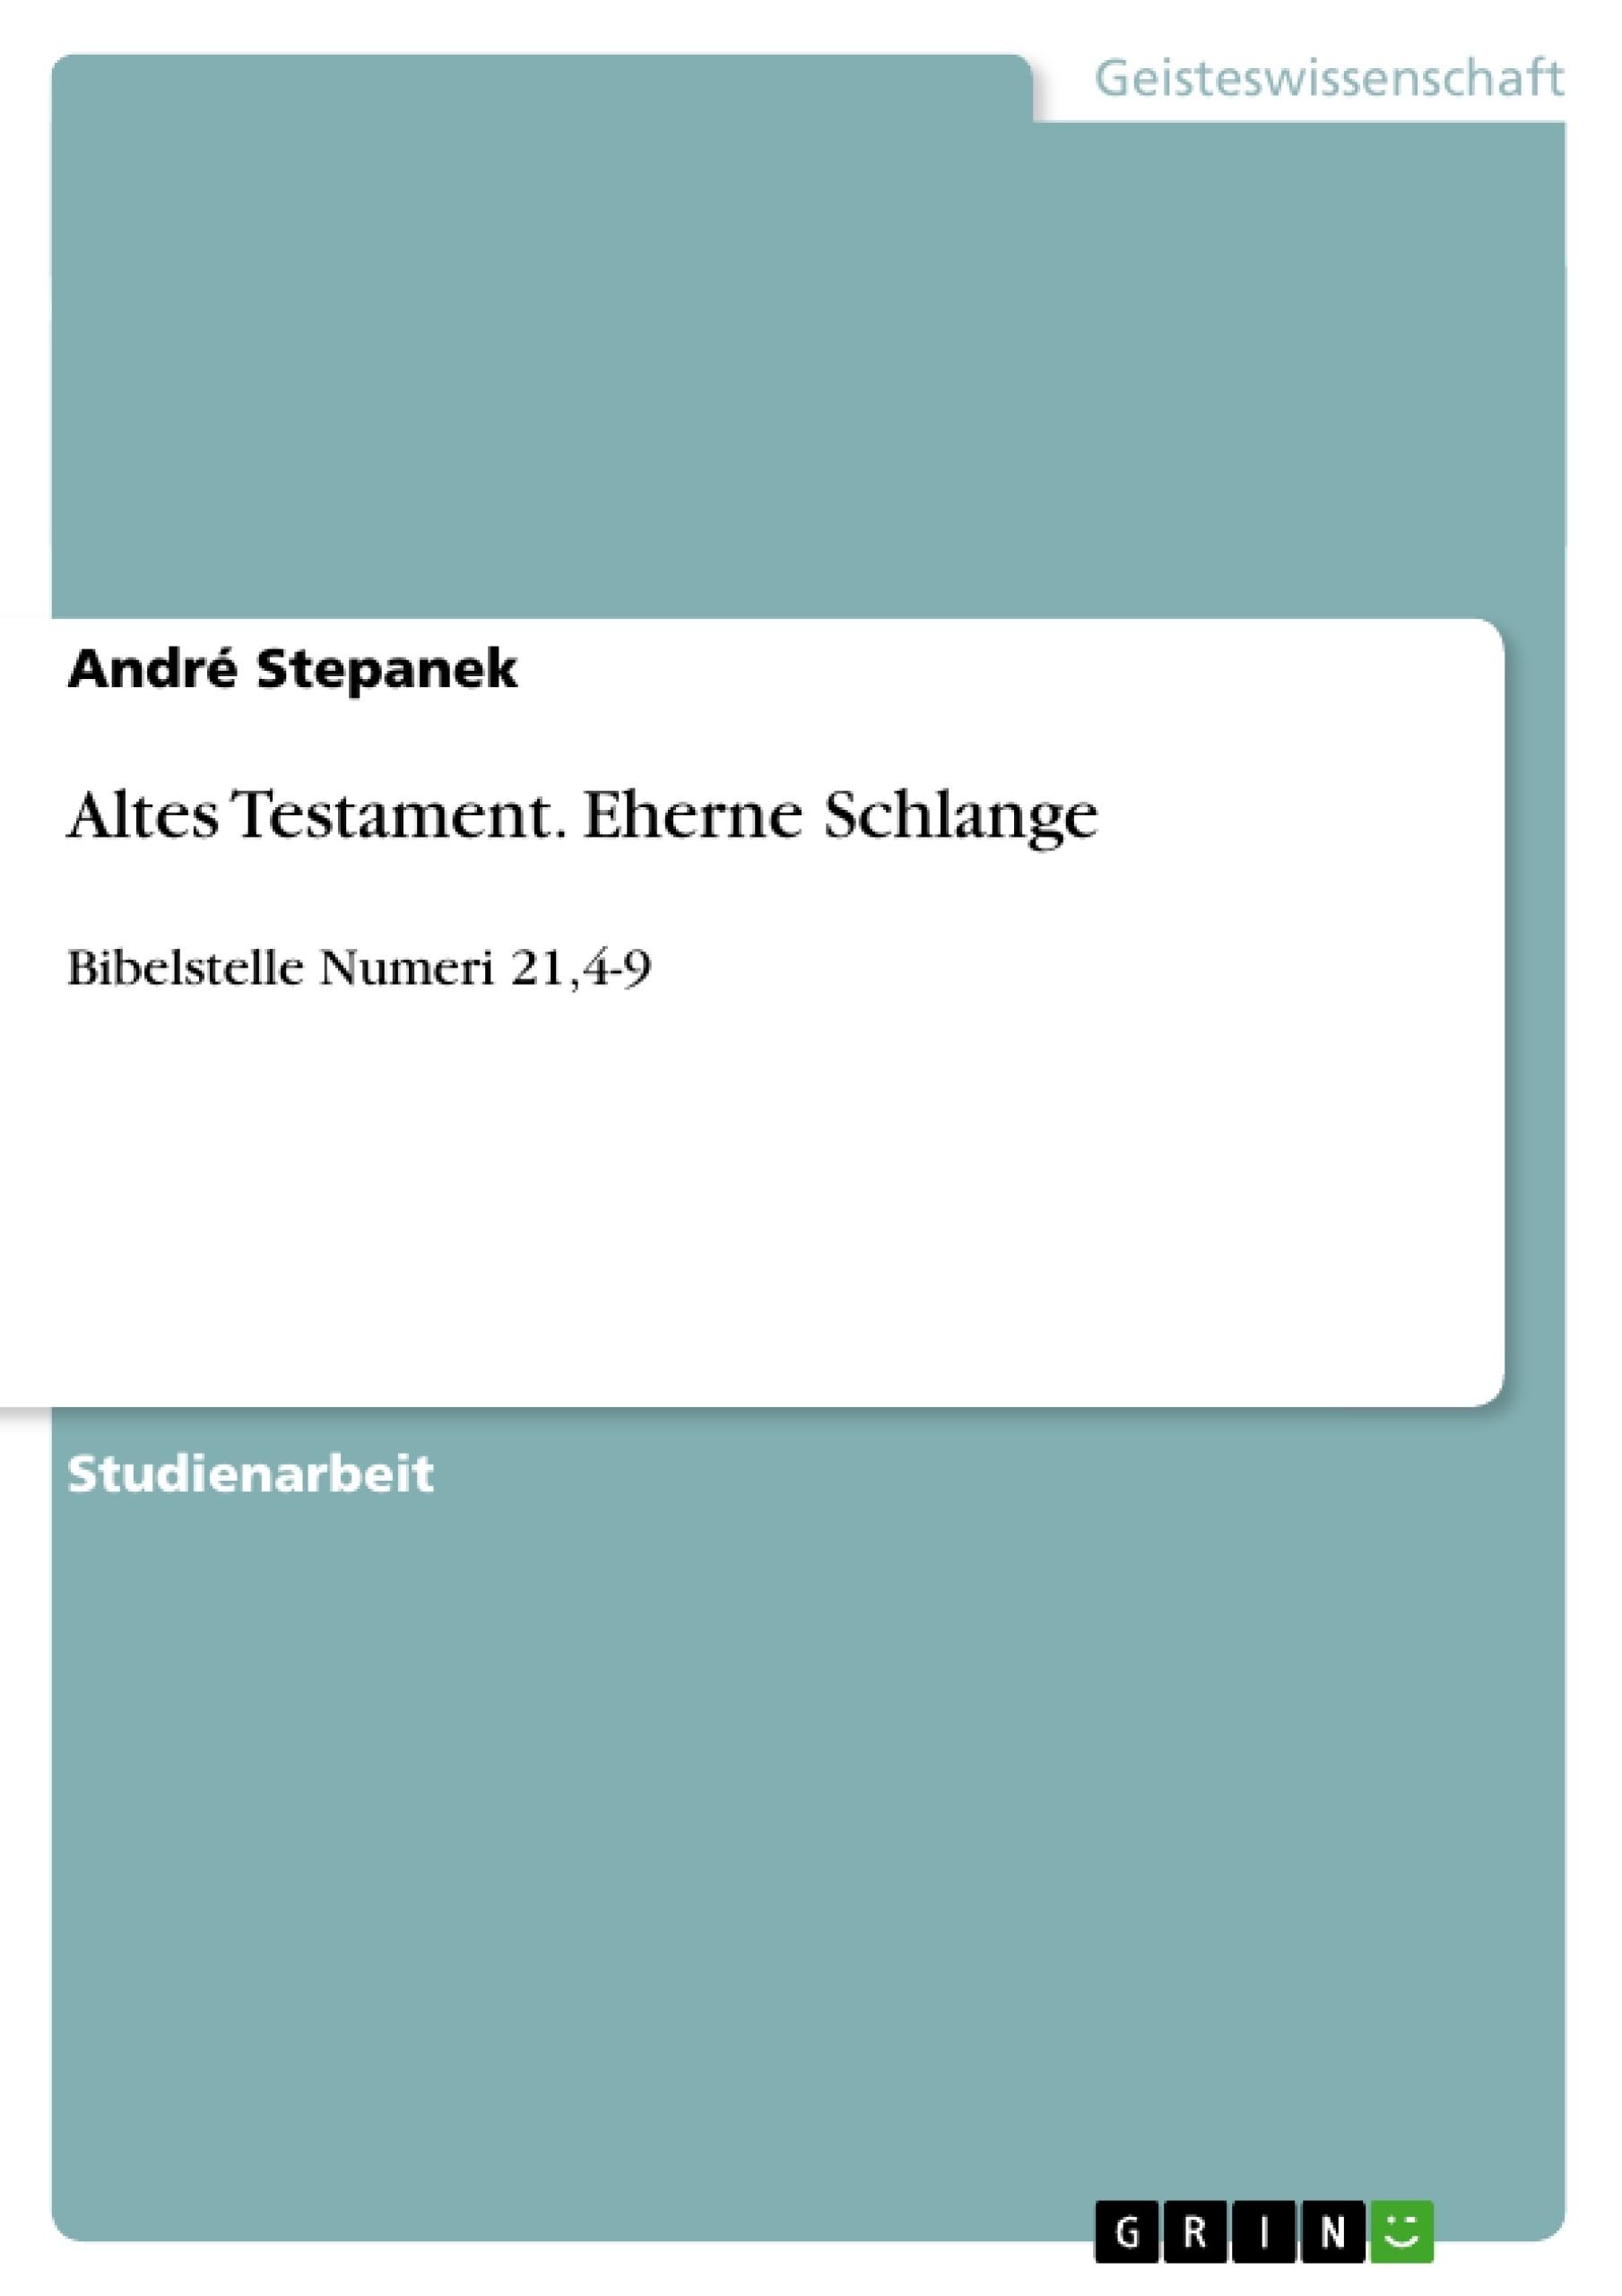 Titel: Altes Testament. Eherne Schlange